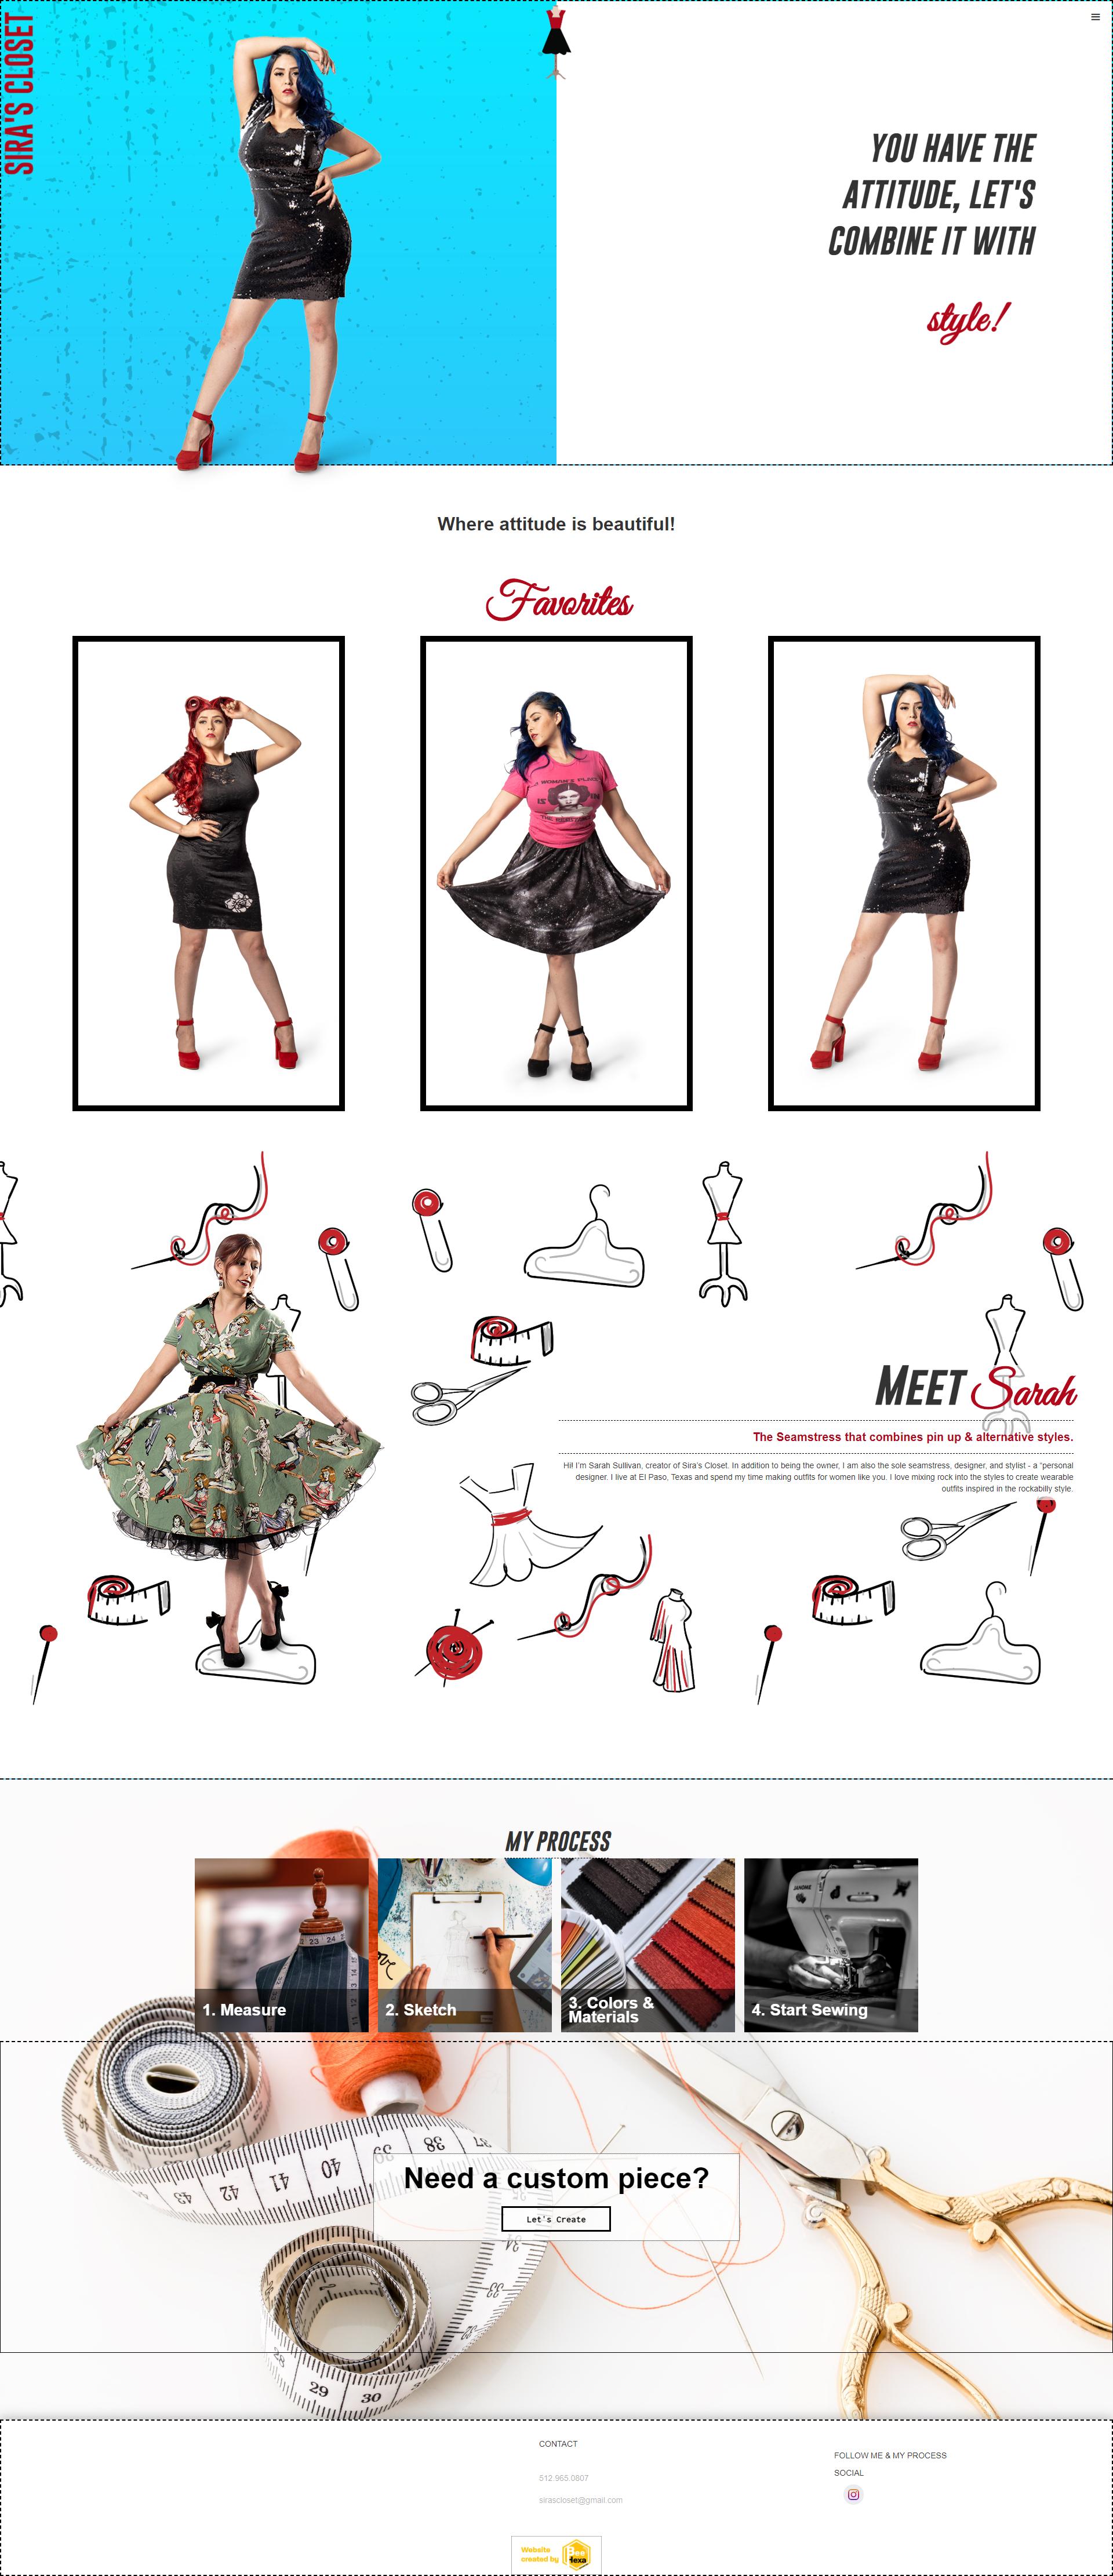 Portfolio Image of Service Fashion Designer Web Design